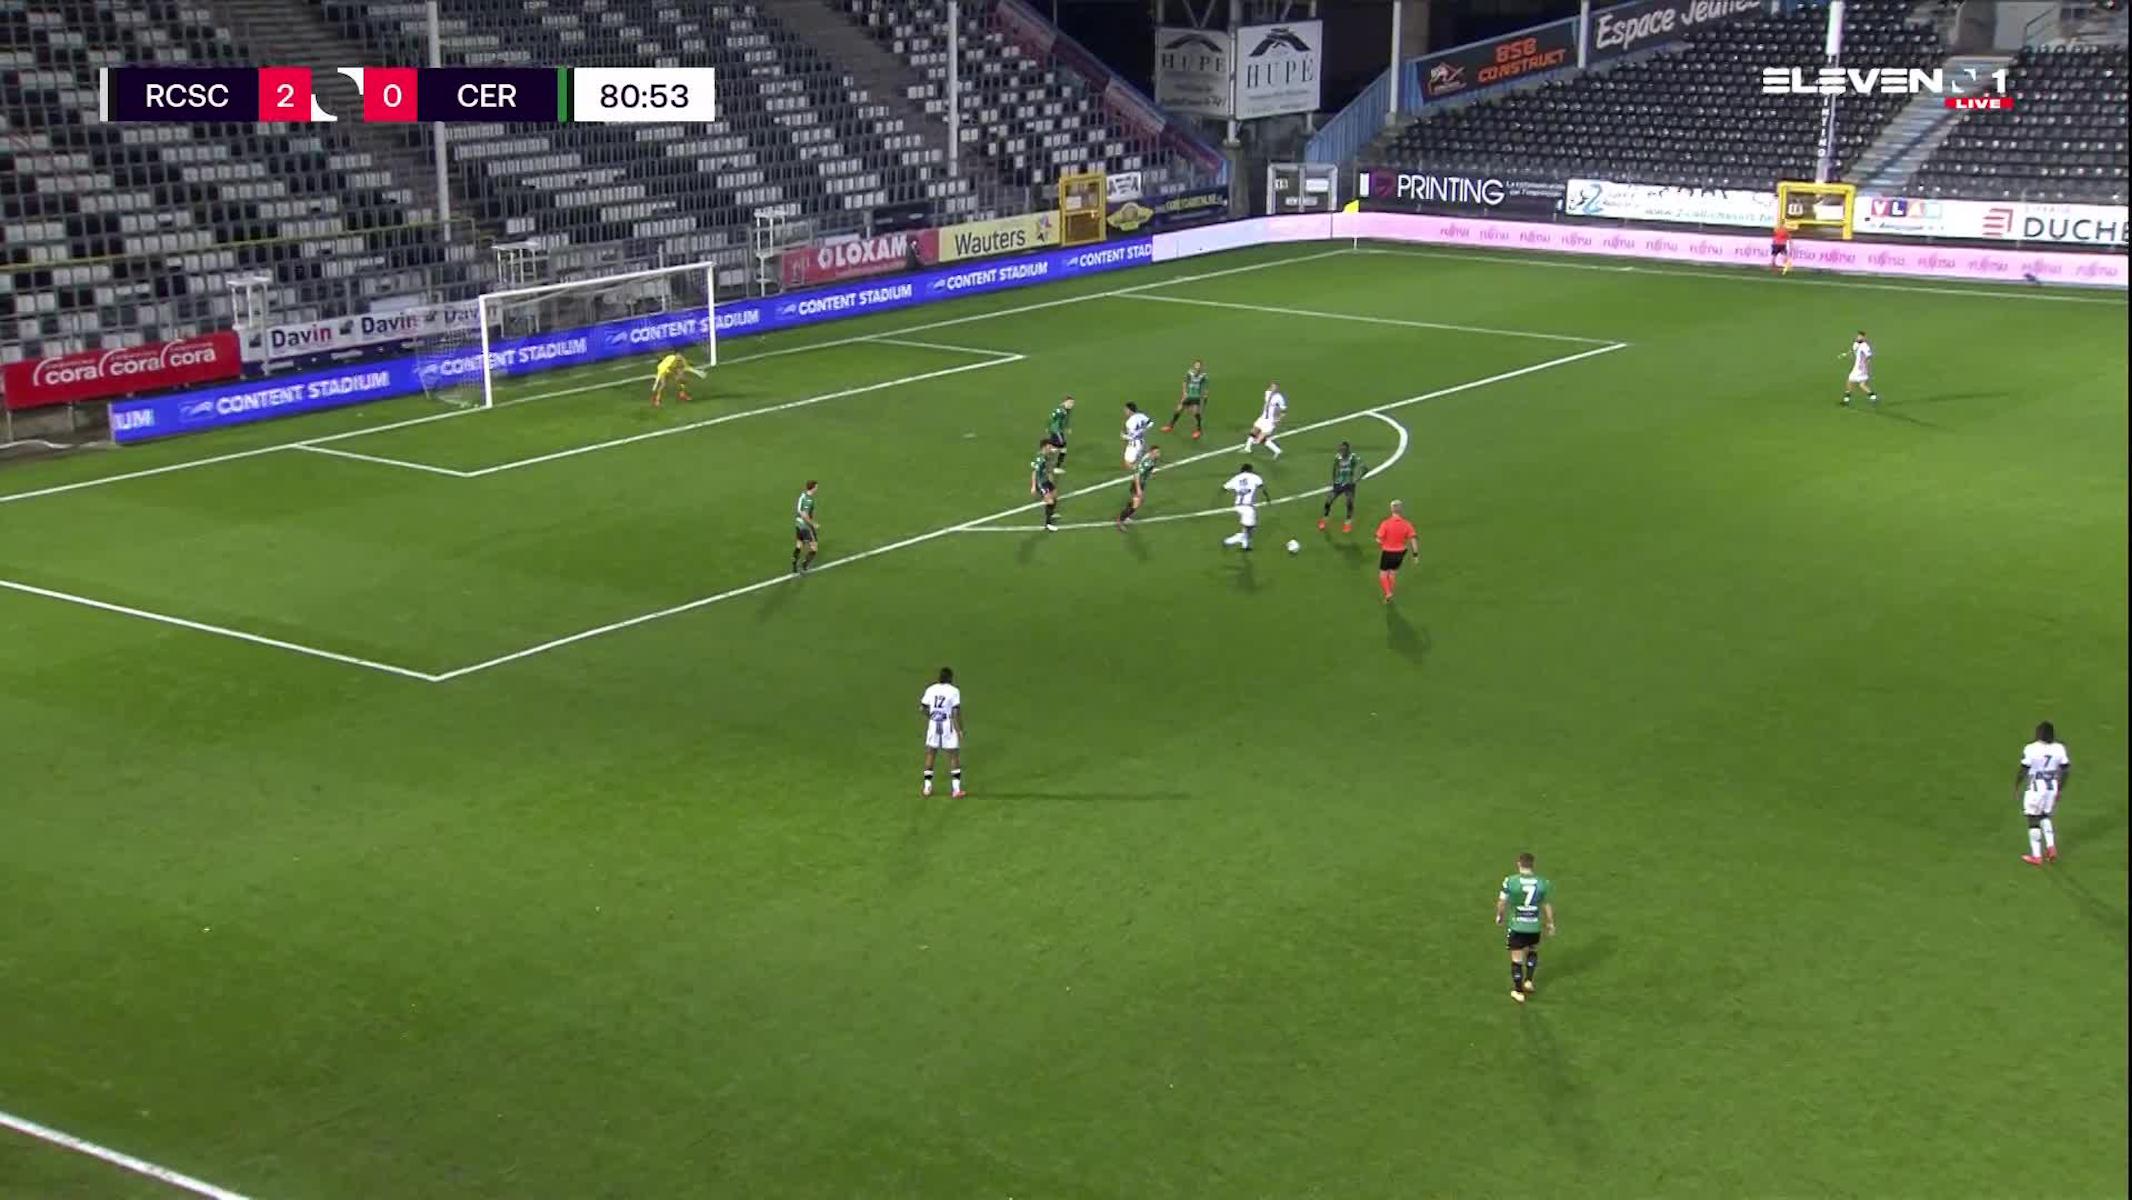 Doelpunt Shamar Nicholson (Sporting Charleroi vs. Cercle Brugge)